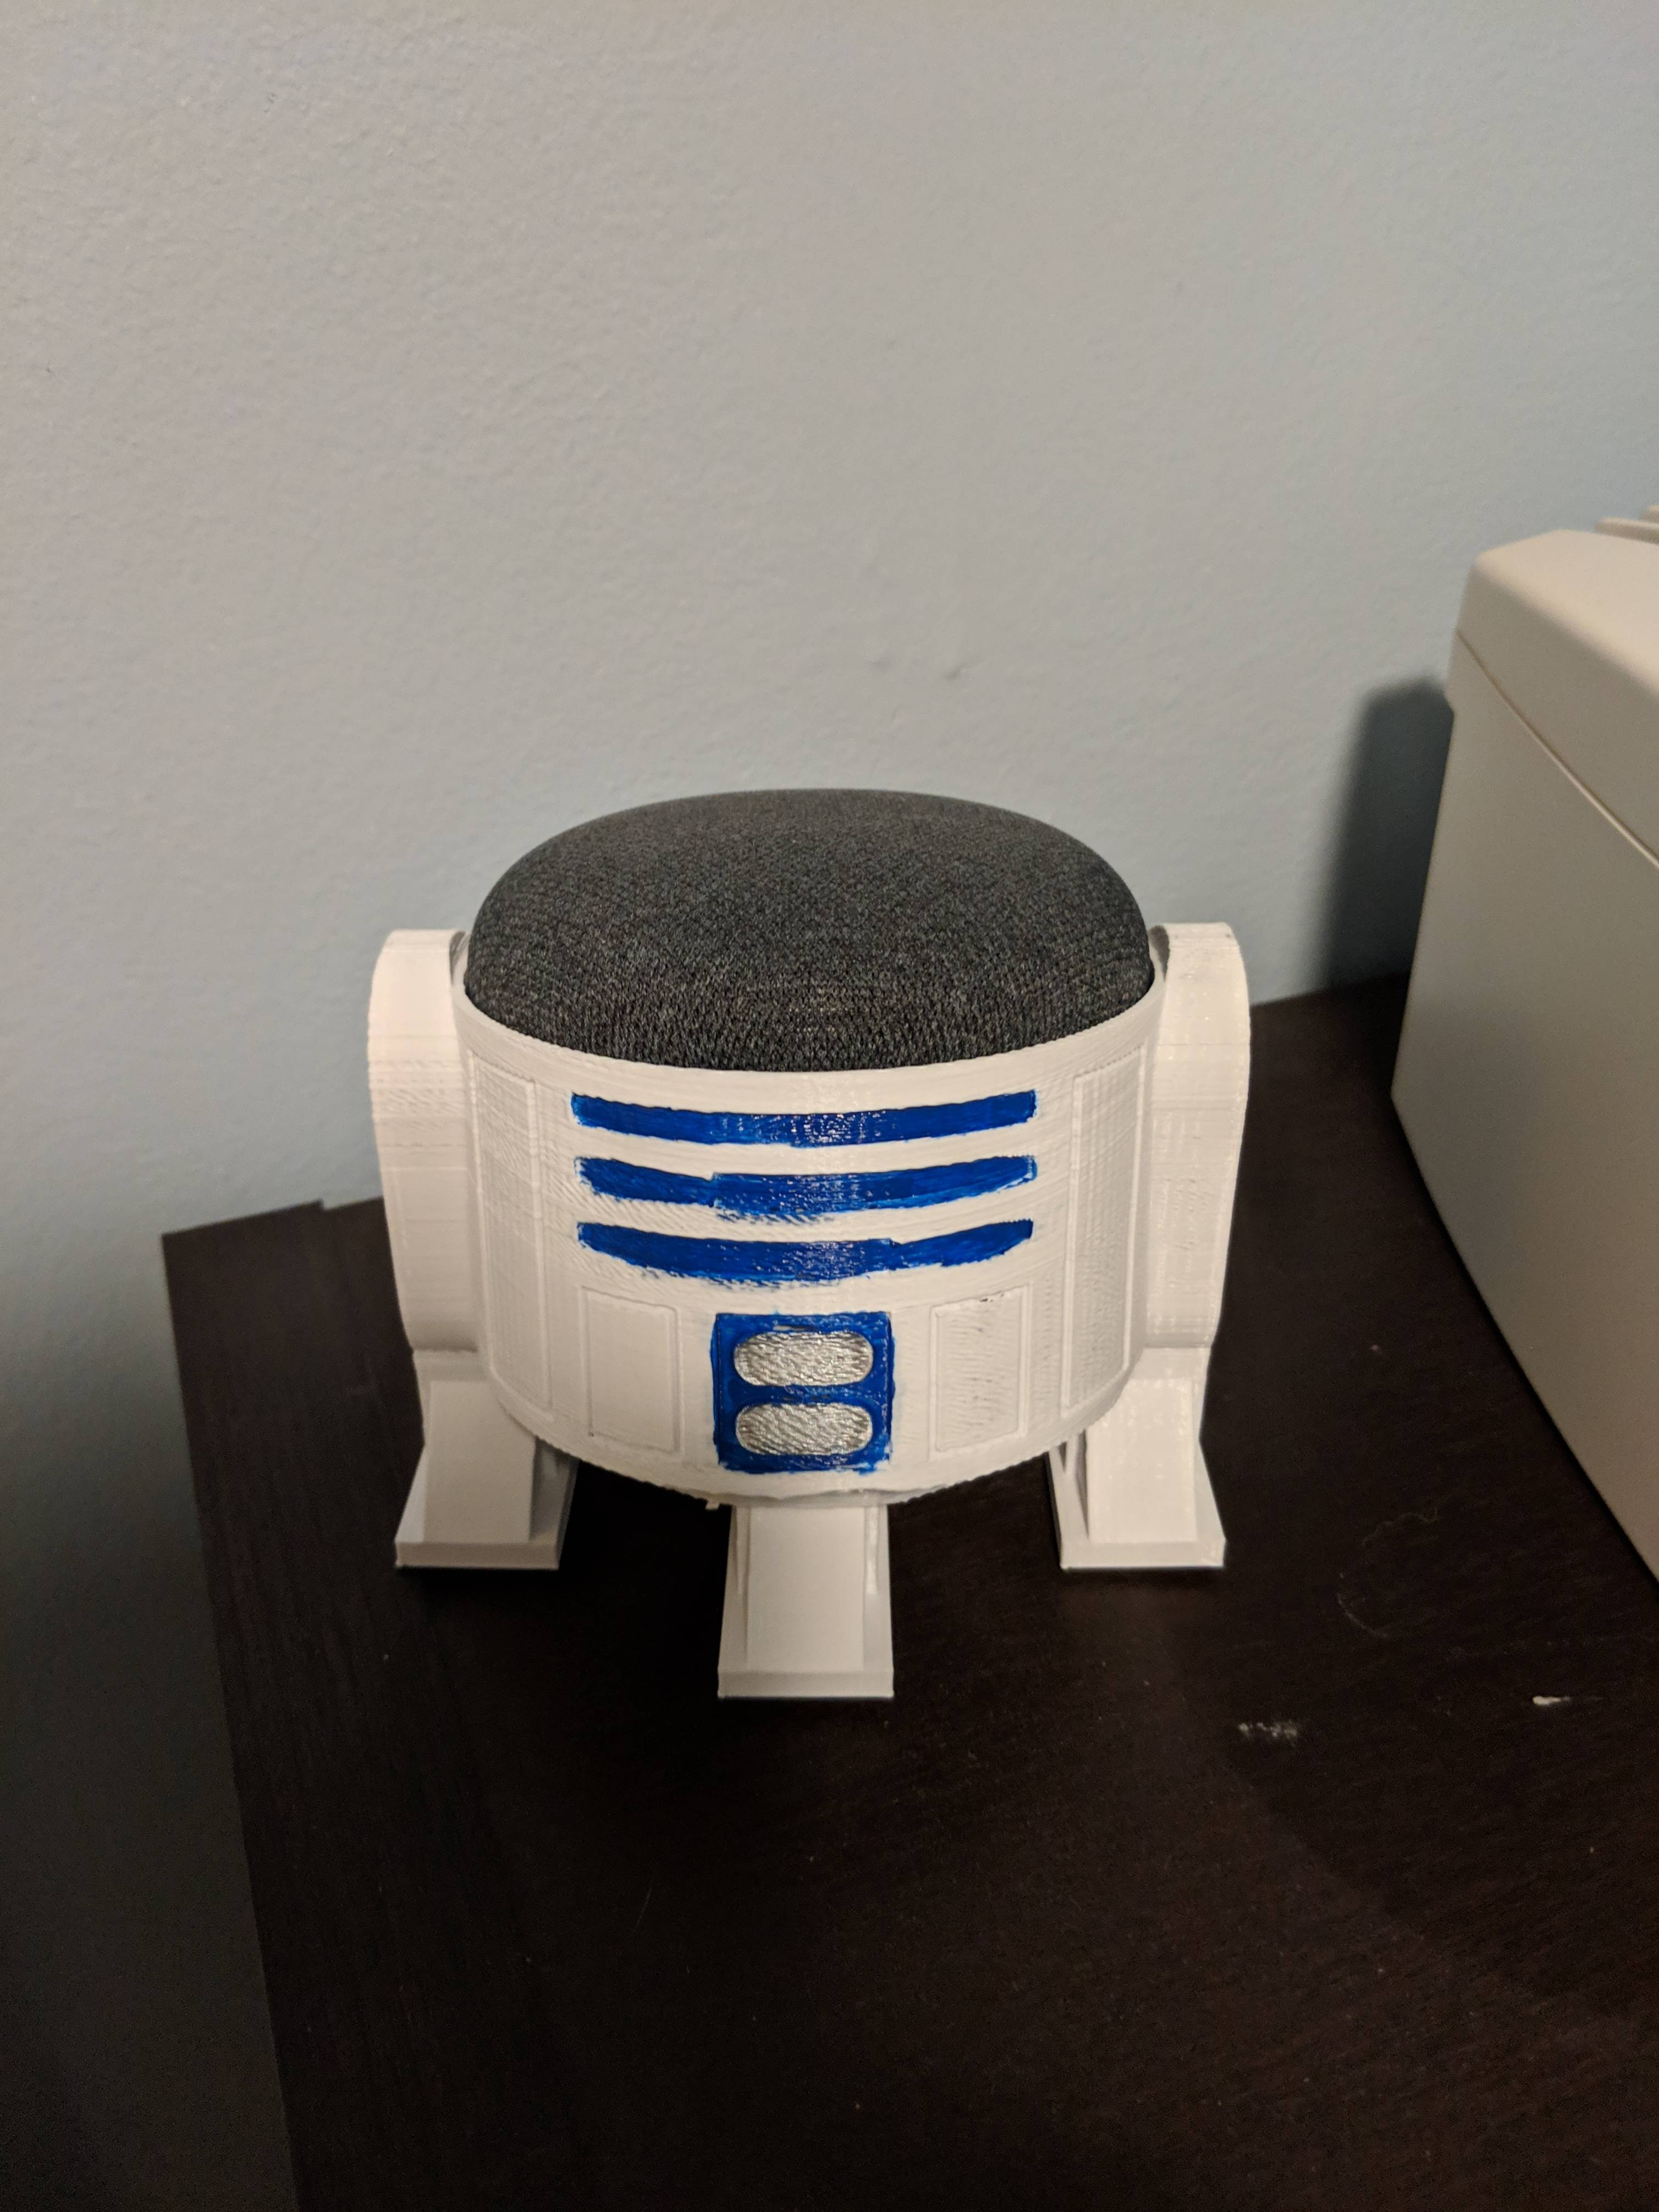 My 3d printed R2D2 Google home mini stand